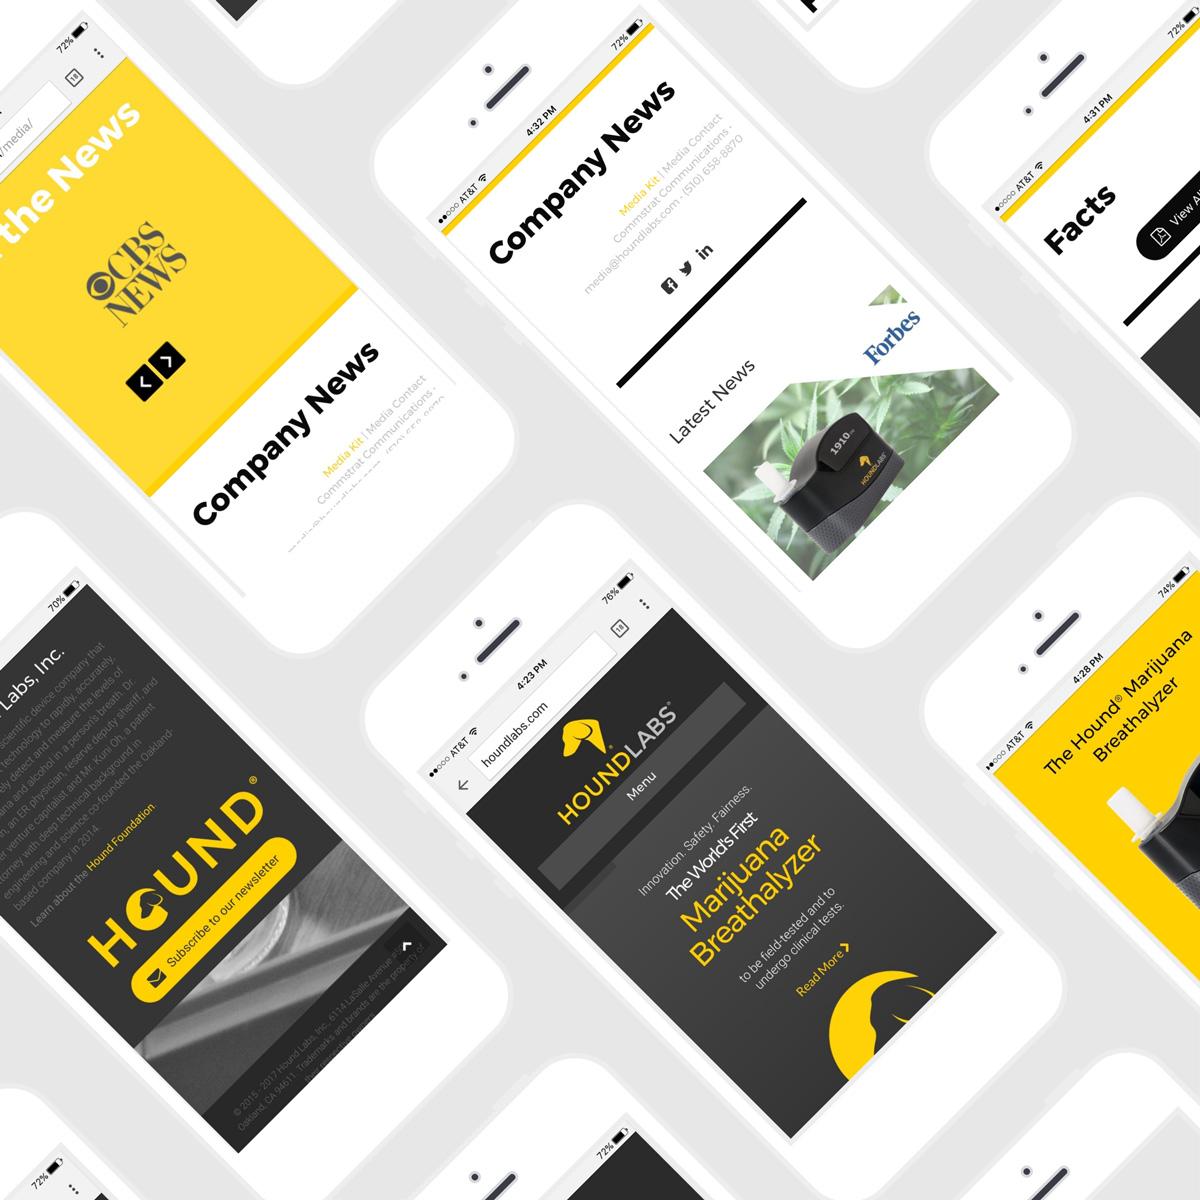 Hound Labs Digital Marketing